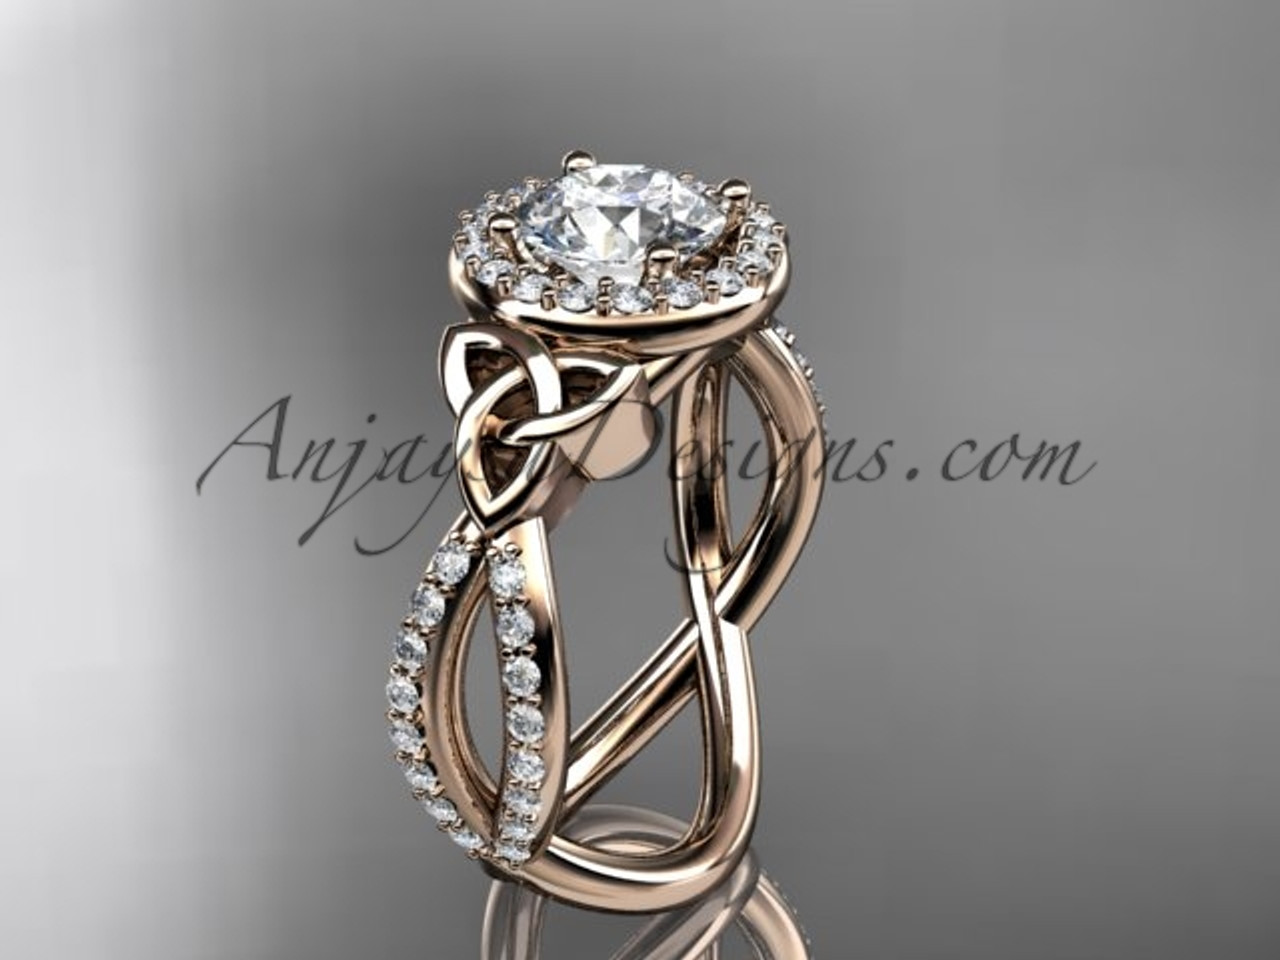 14kt rose gold diamond celtic trinity knot engagement ring wedding band